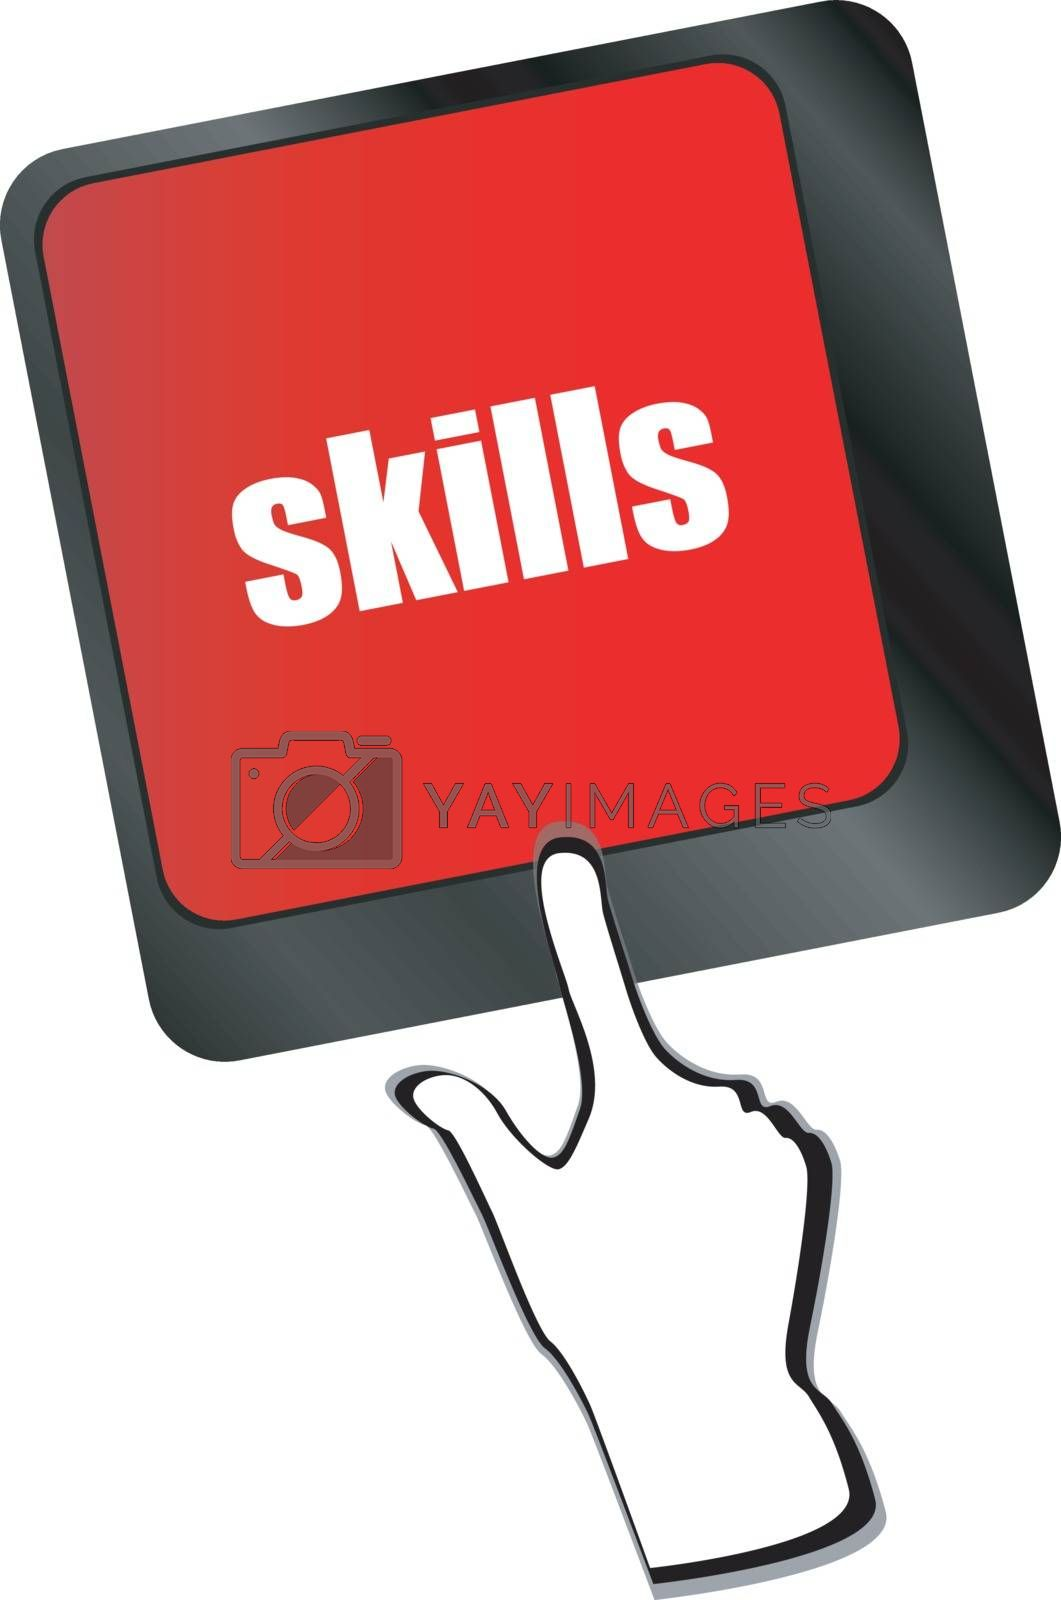 skills message on enter key of keyboard vector